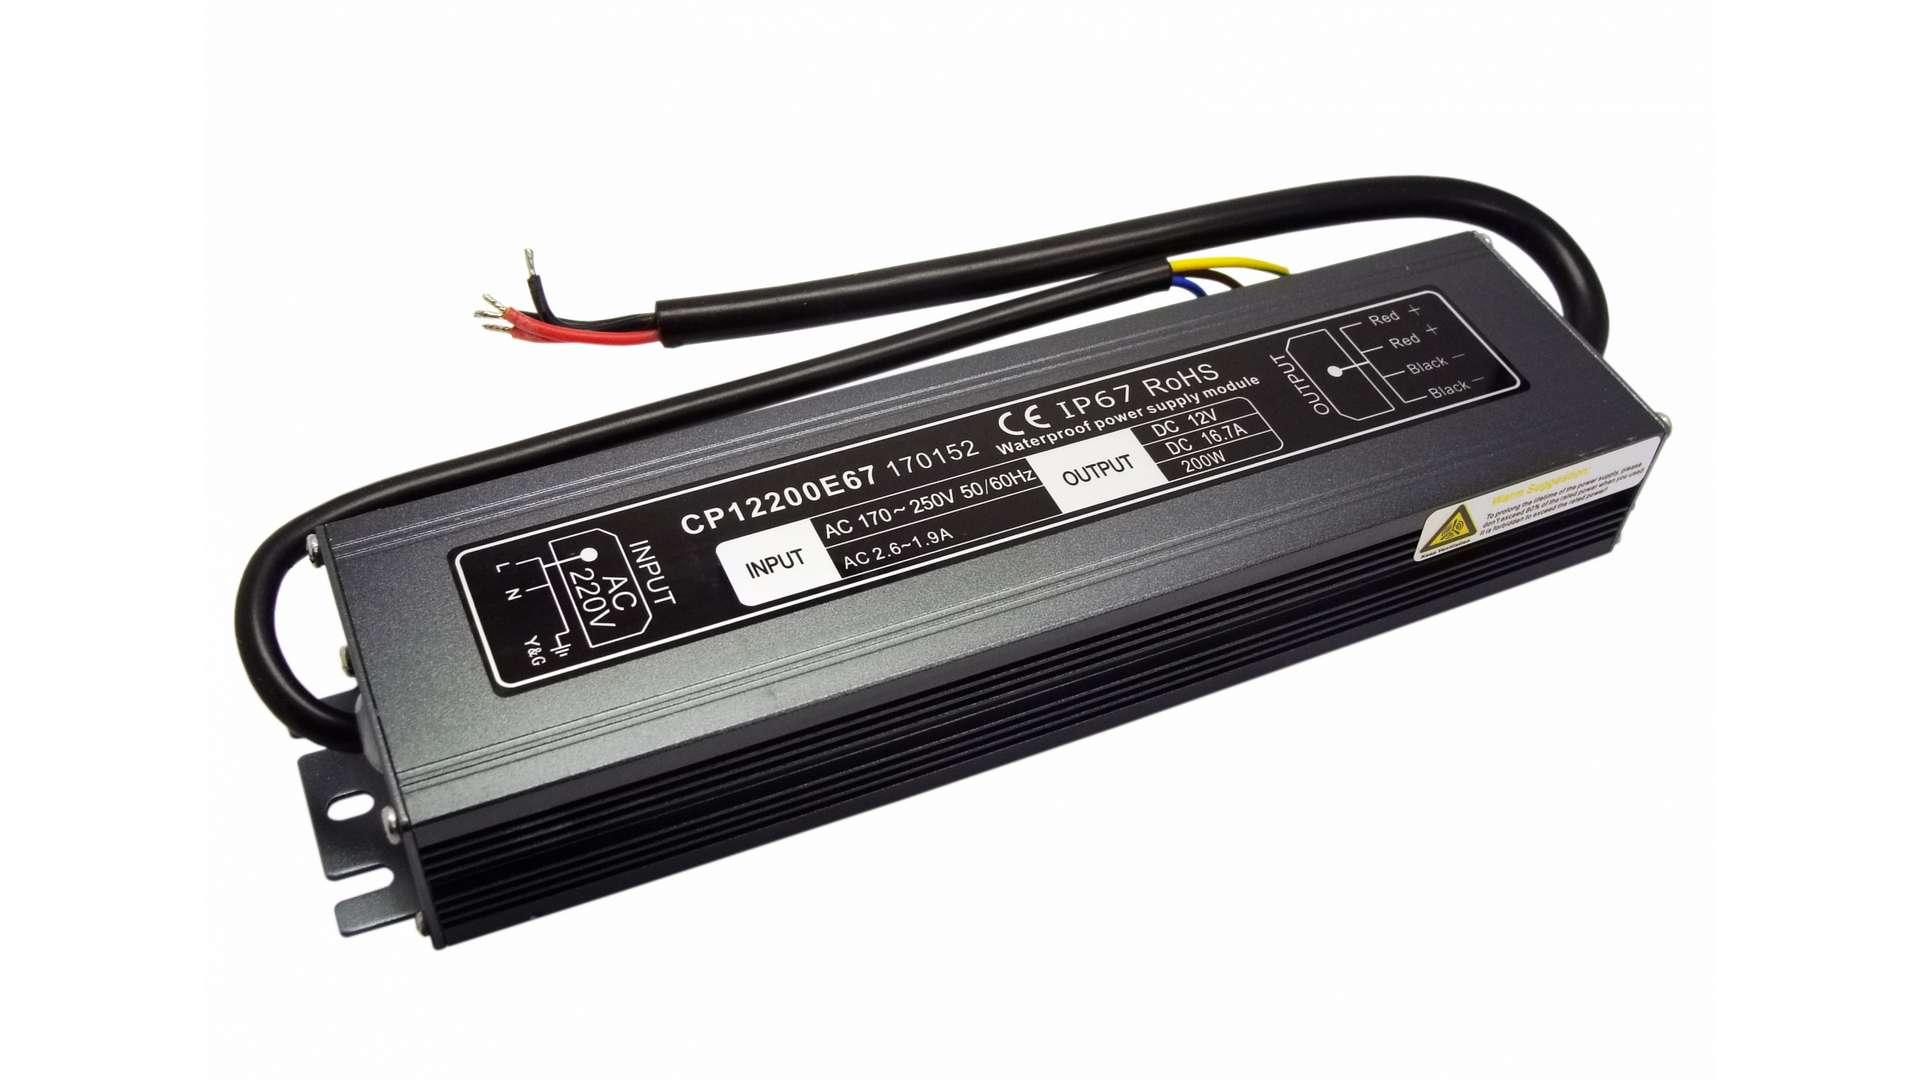 12V 200W IP67 metal case power supply